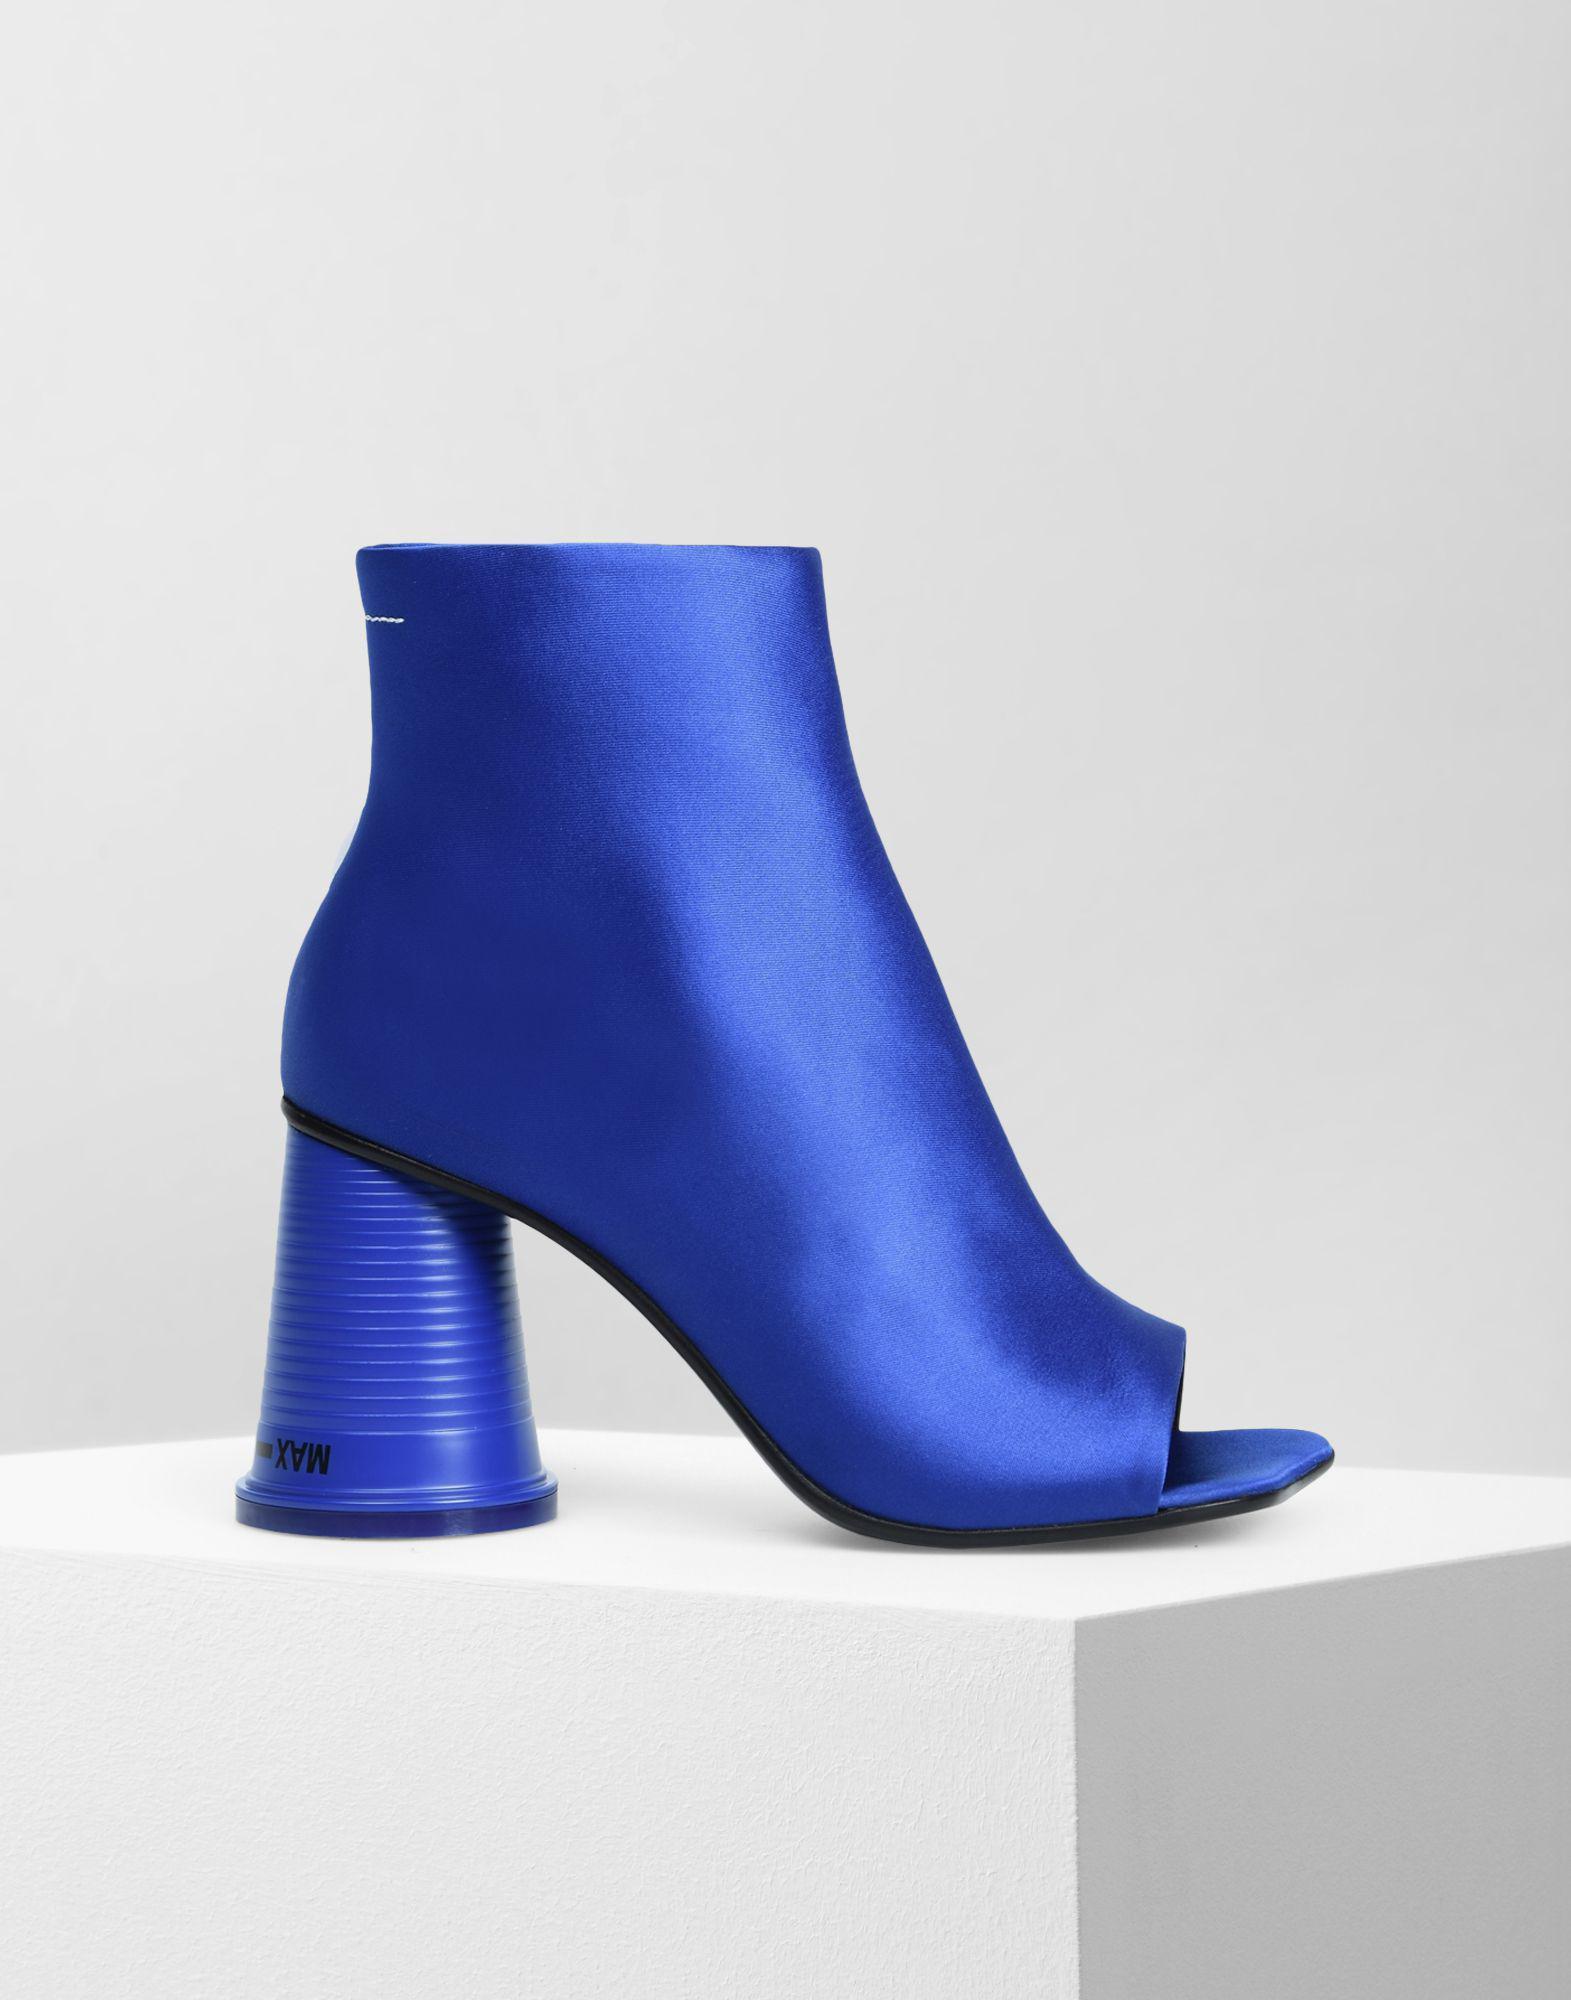 de5ac1f67 MM6 by Maison Martin Margiela Peep-toe Cup Heel Ankle Boots in Blue ...